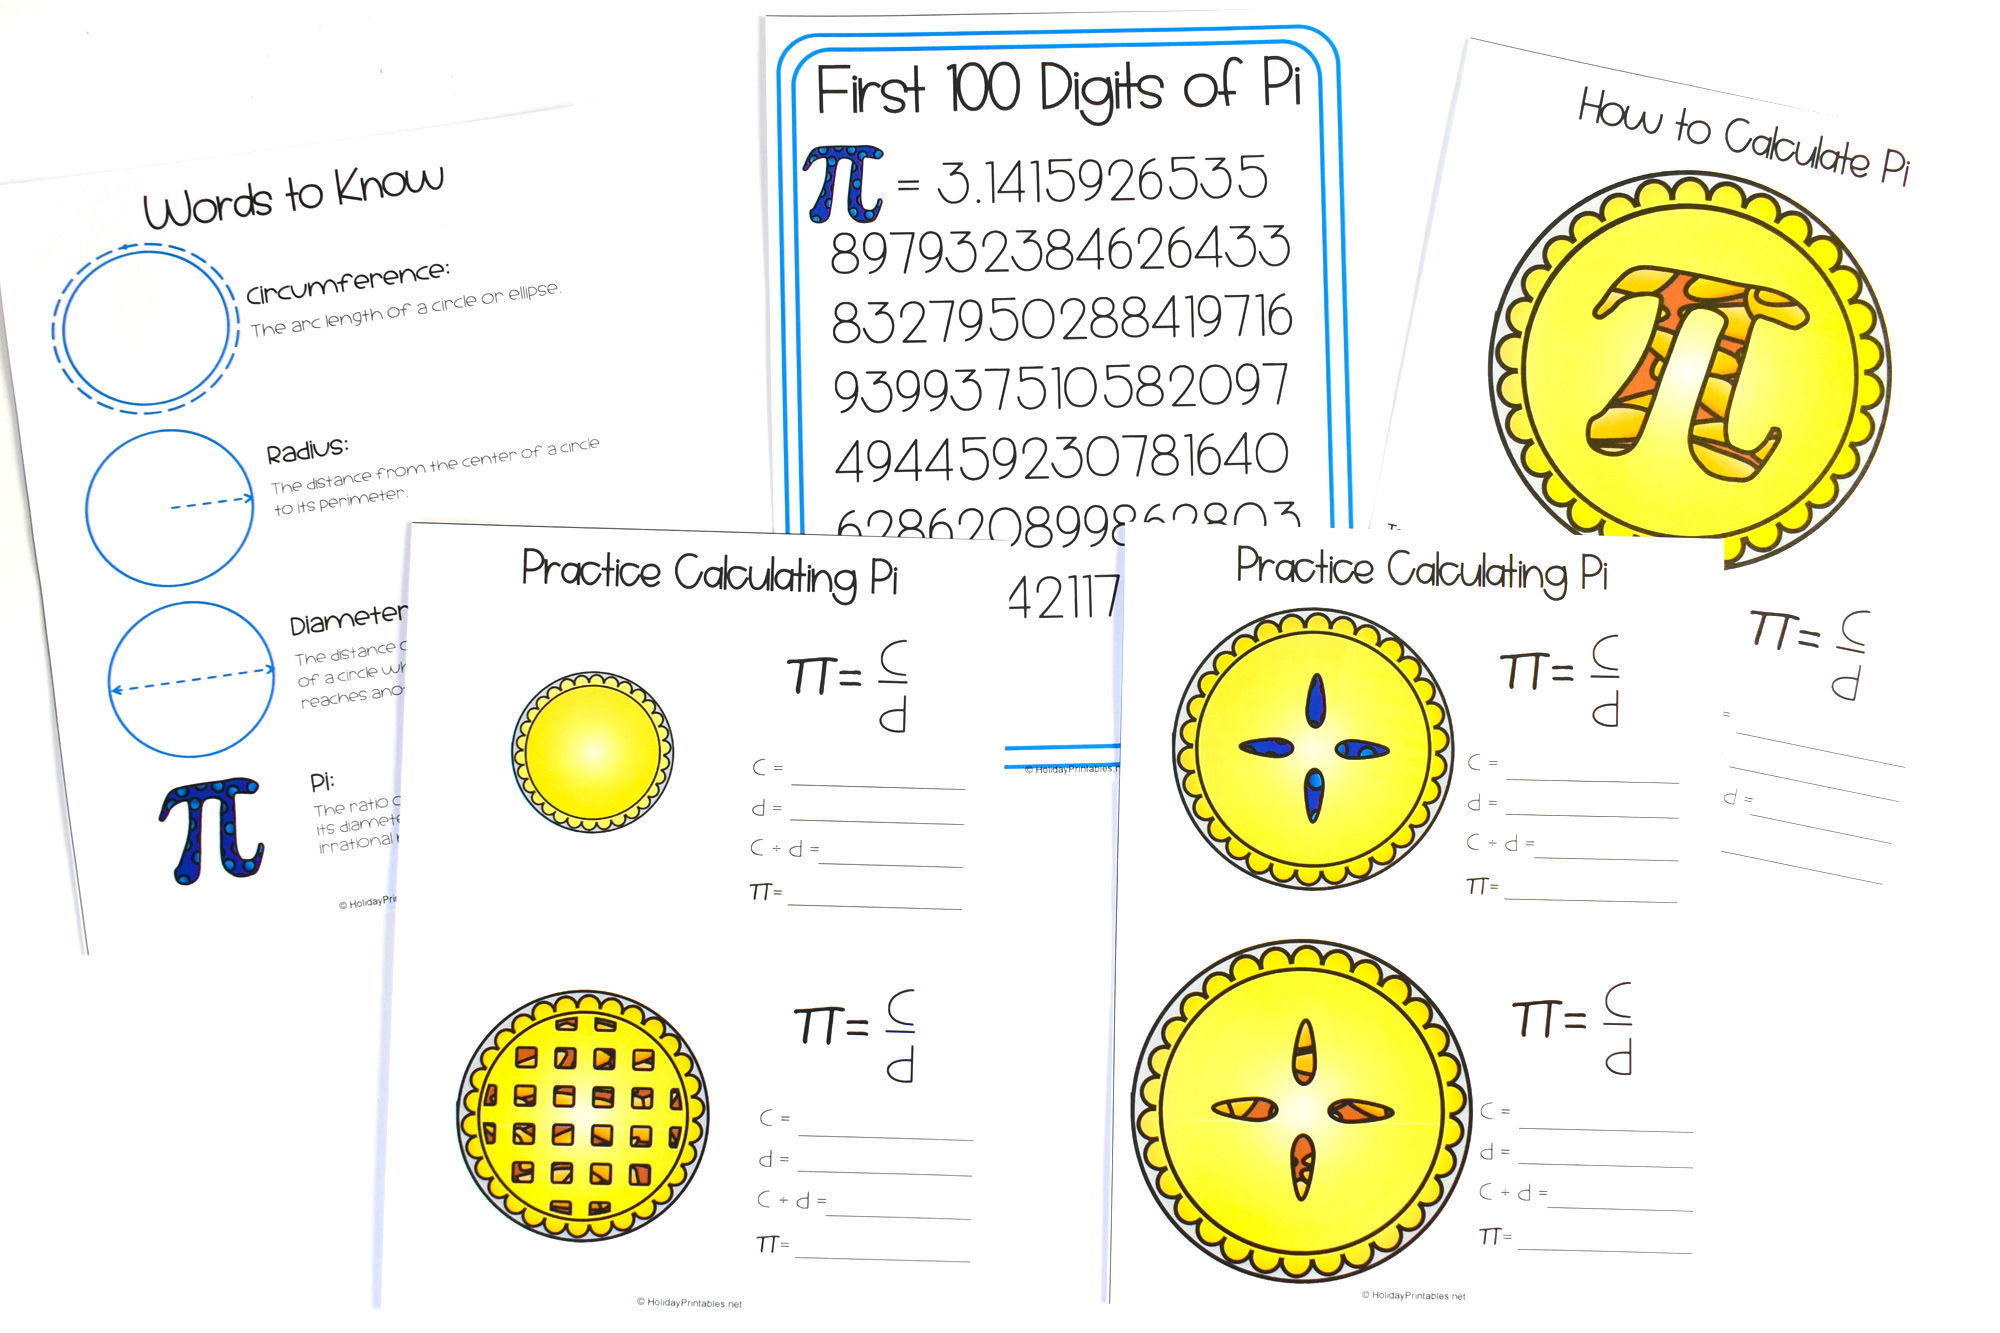 Pi Day Printable Pack   HolidayPrintables.net #piday #math #stem #printables #holidayprintables #weloveprintables